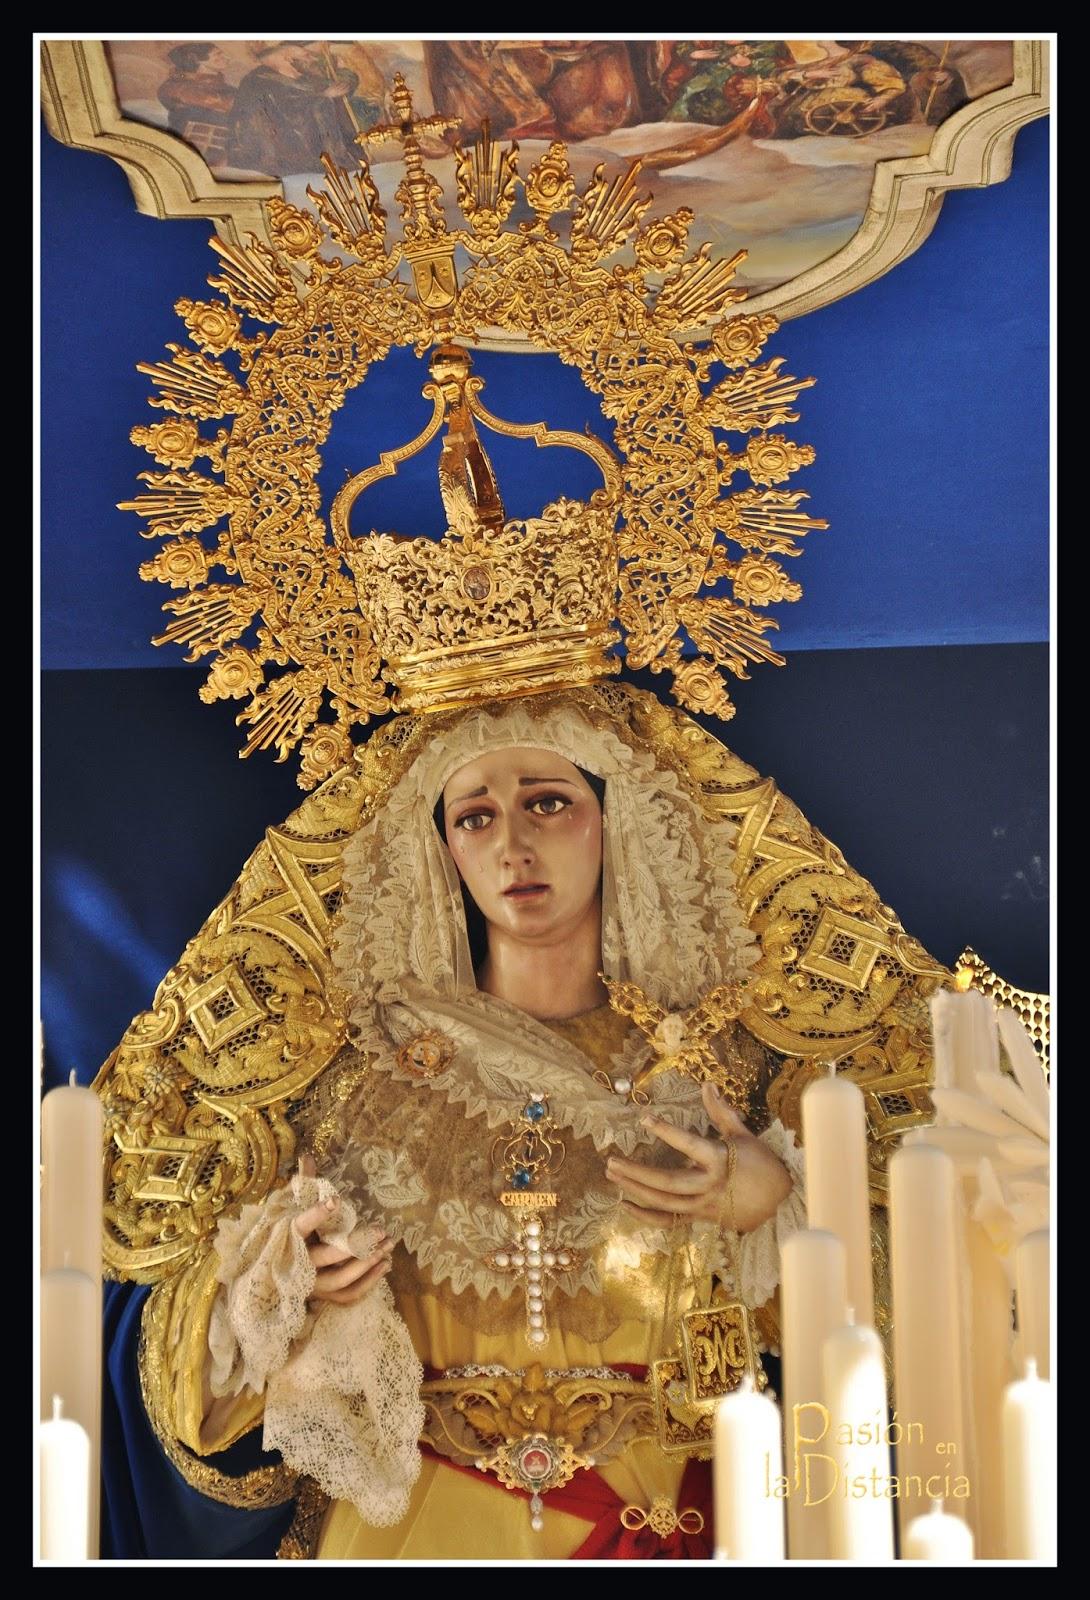 Palio-Carmen-Doloroso-Semana-Santa-Sevilla-2015